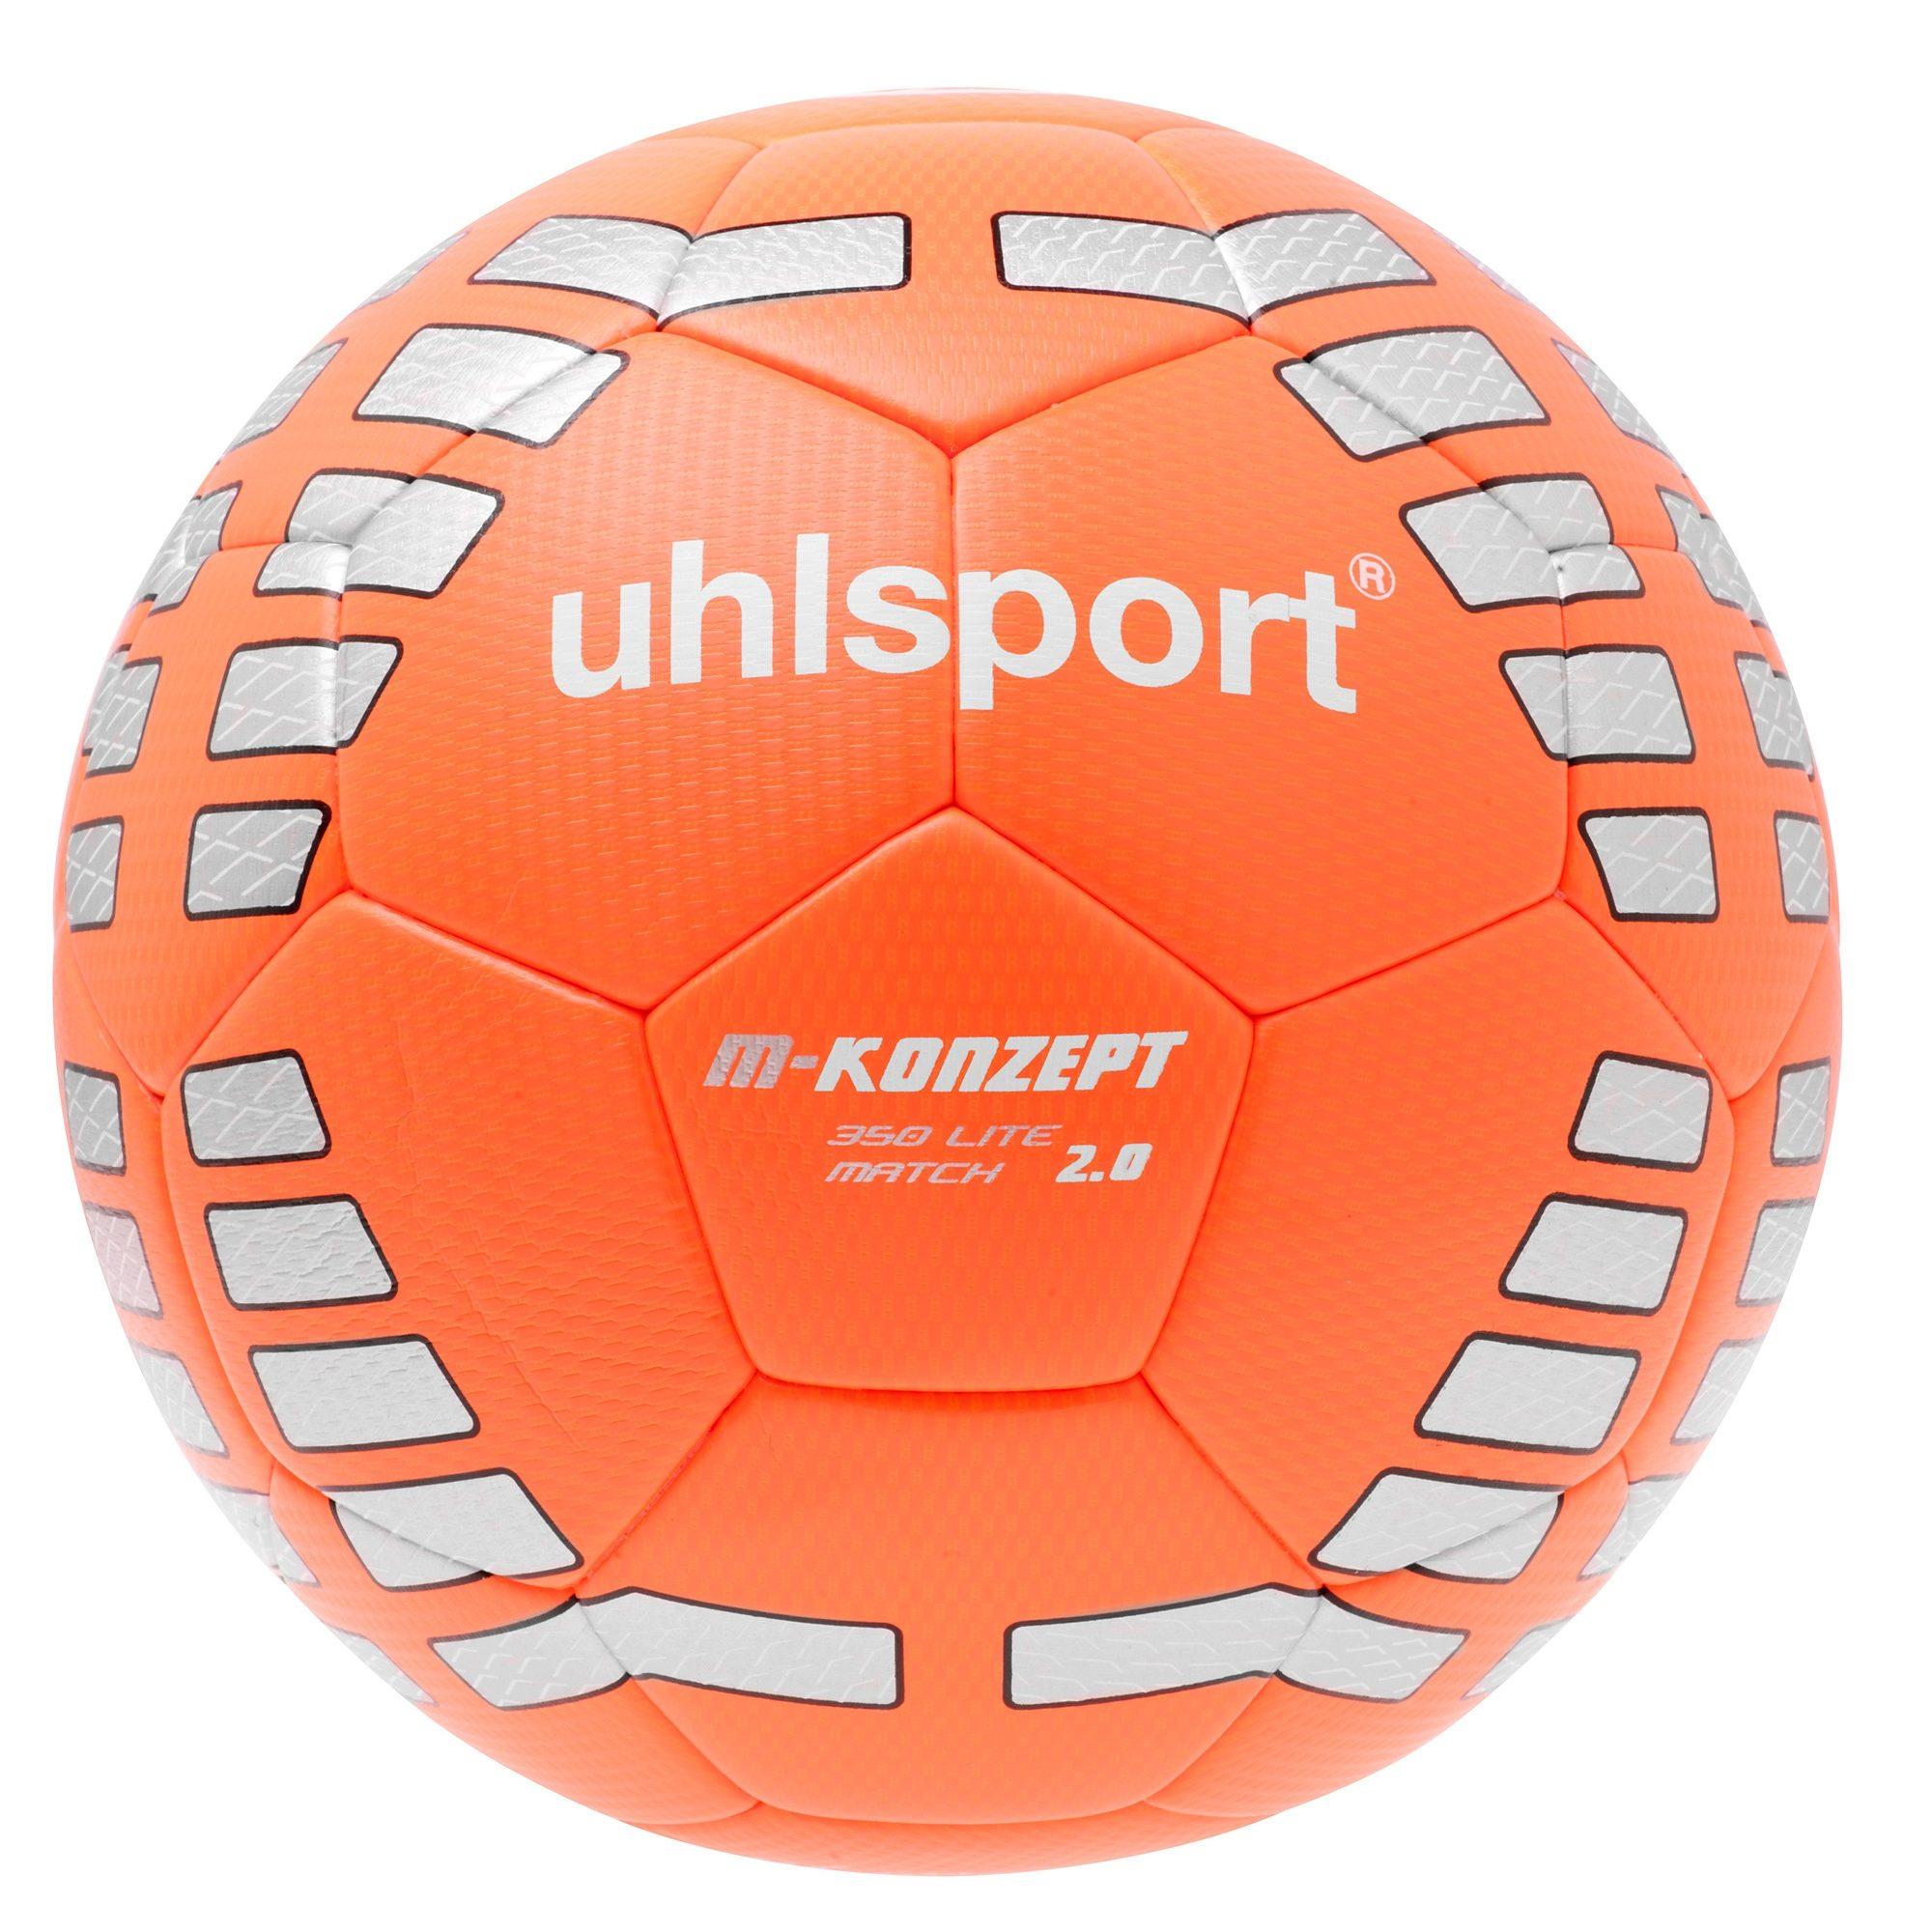 UHLSPORT M-Konzept Lite 350 Match 2.0 Fußball